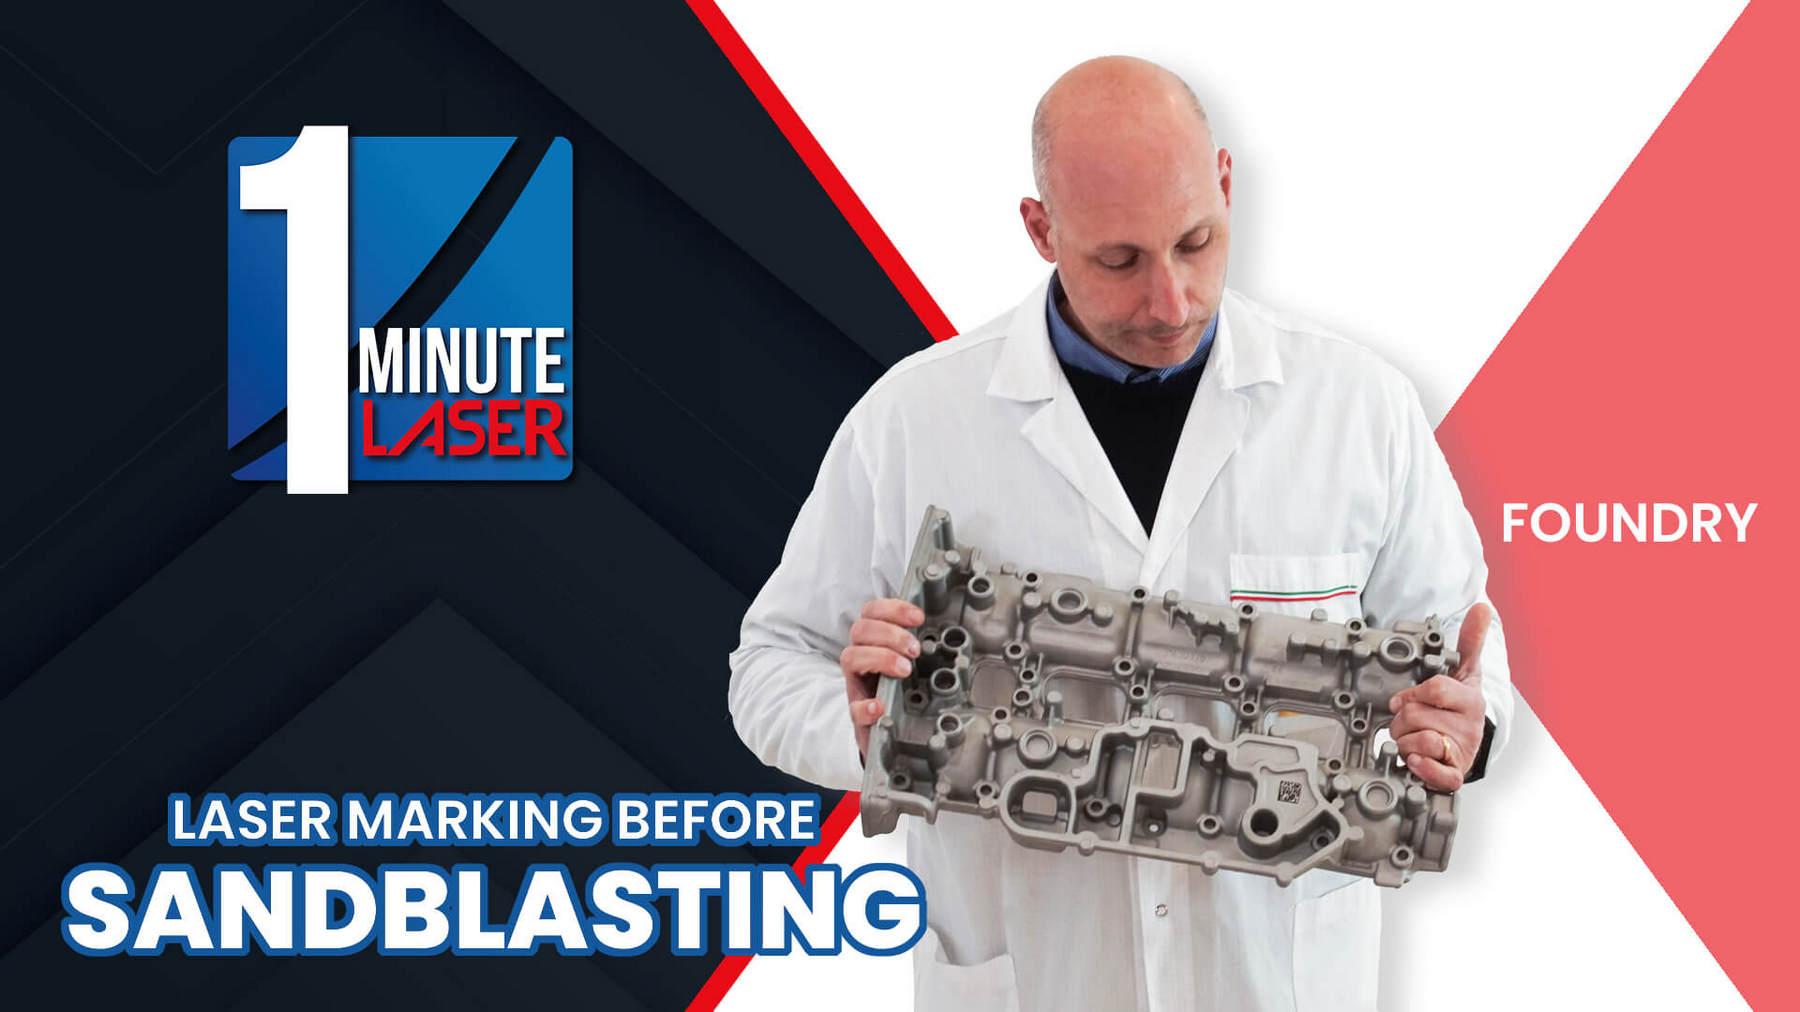 One-Minute-Laser-4-Sandblasting_COPERTINA Foundry